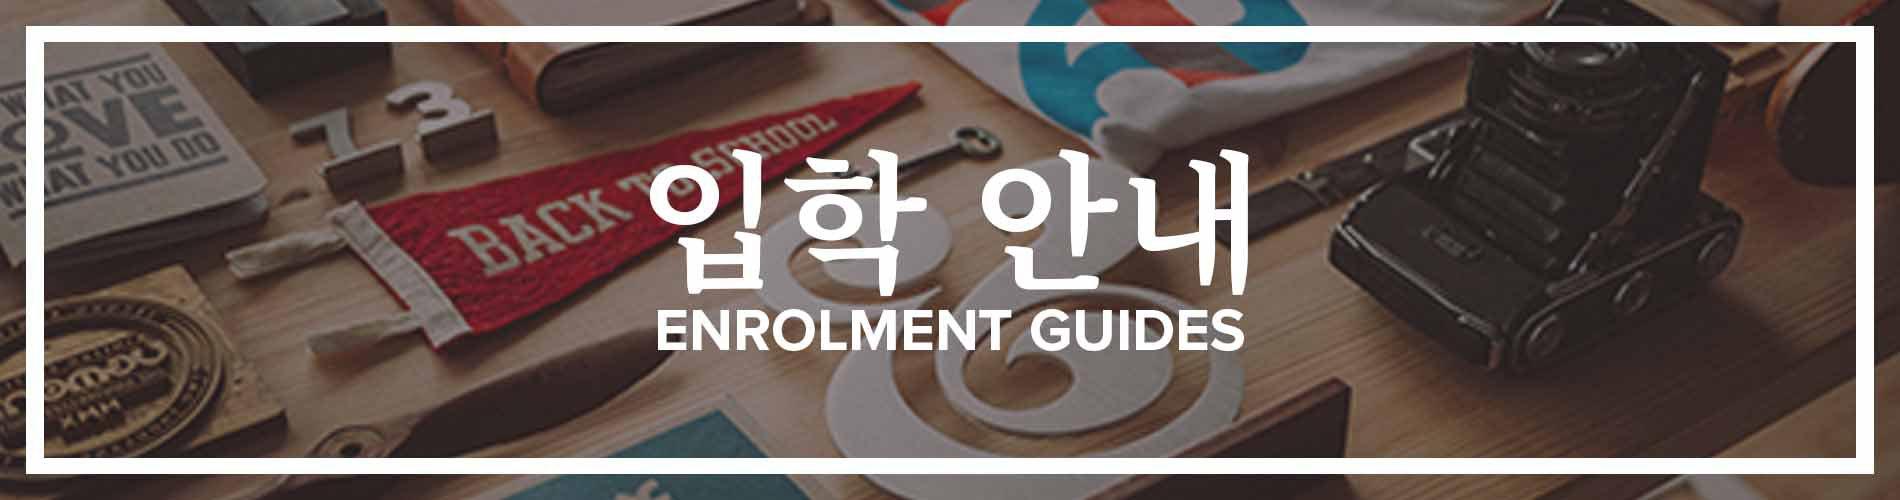 Korean Enrolment Guides Banner